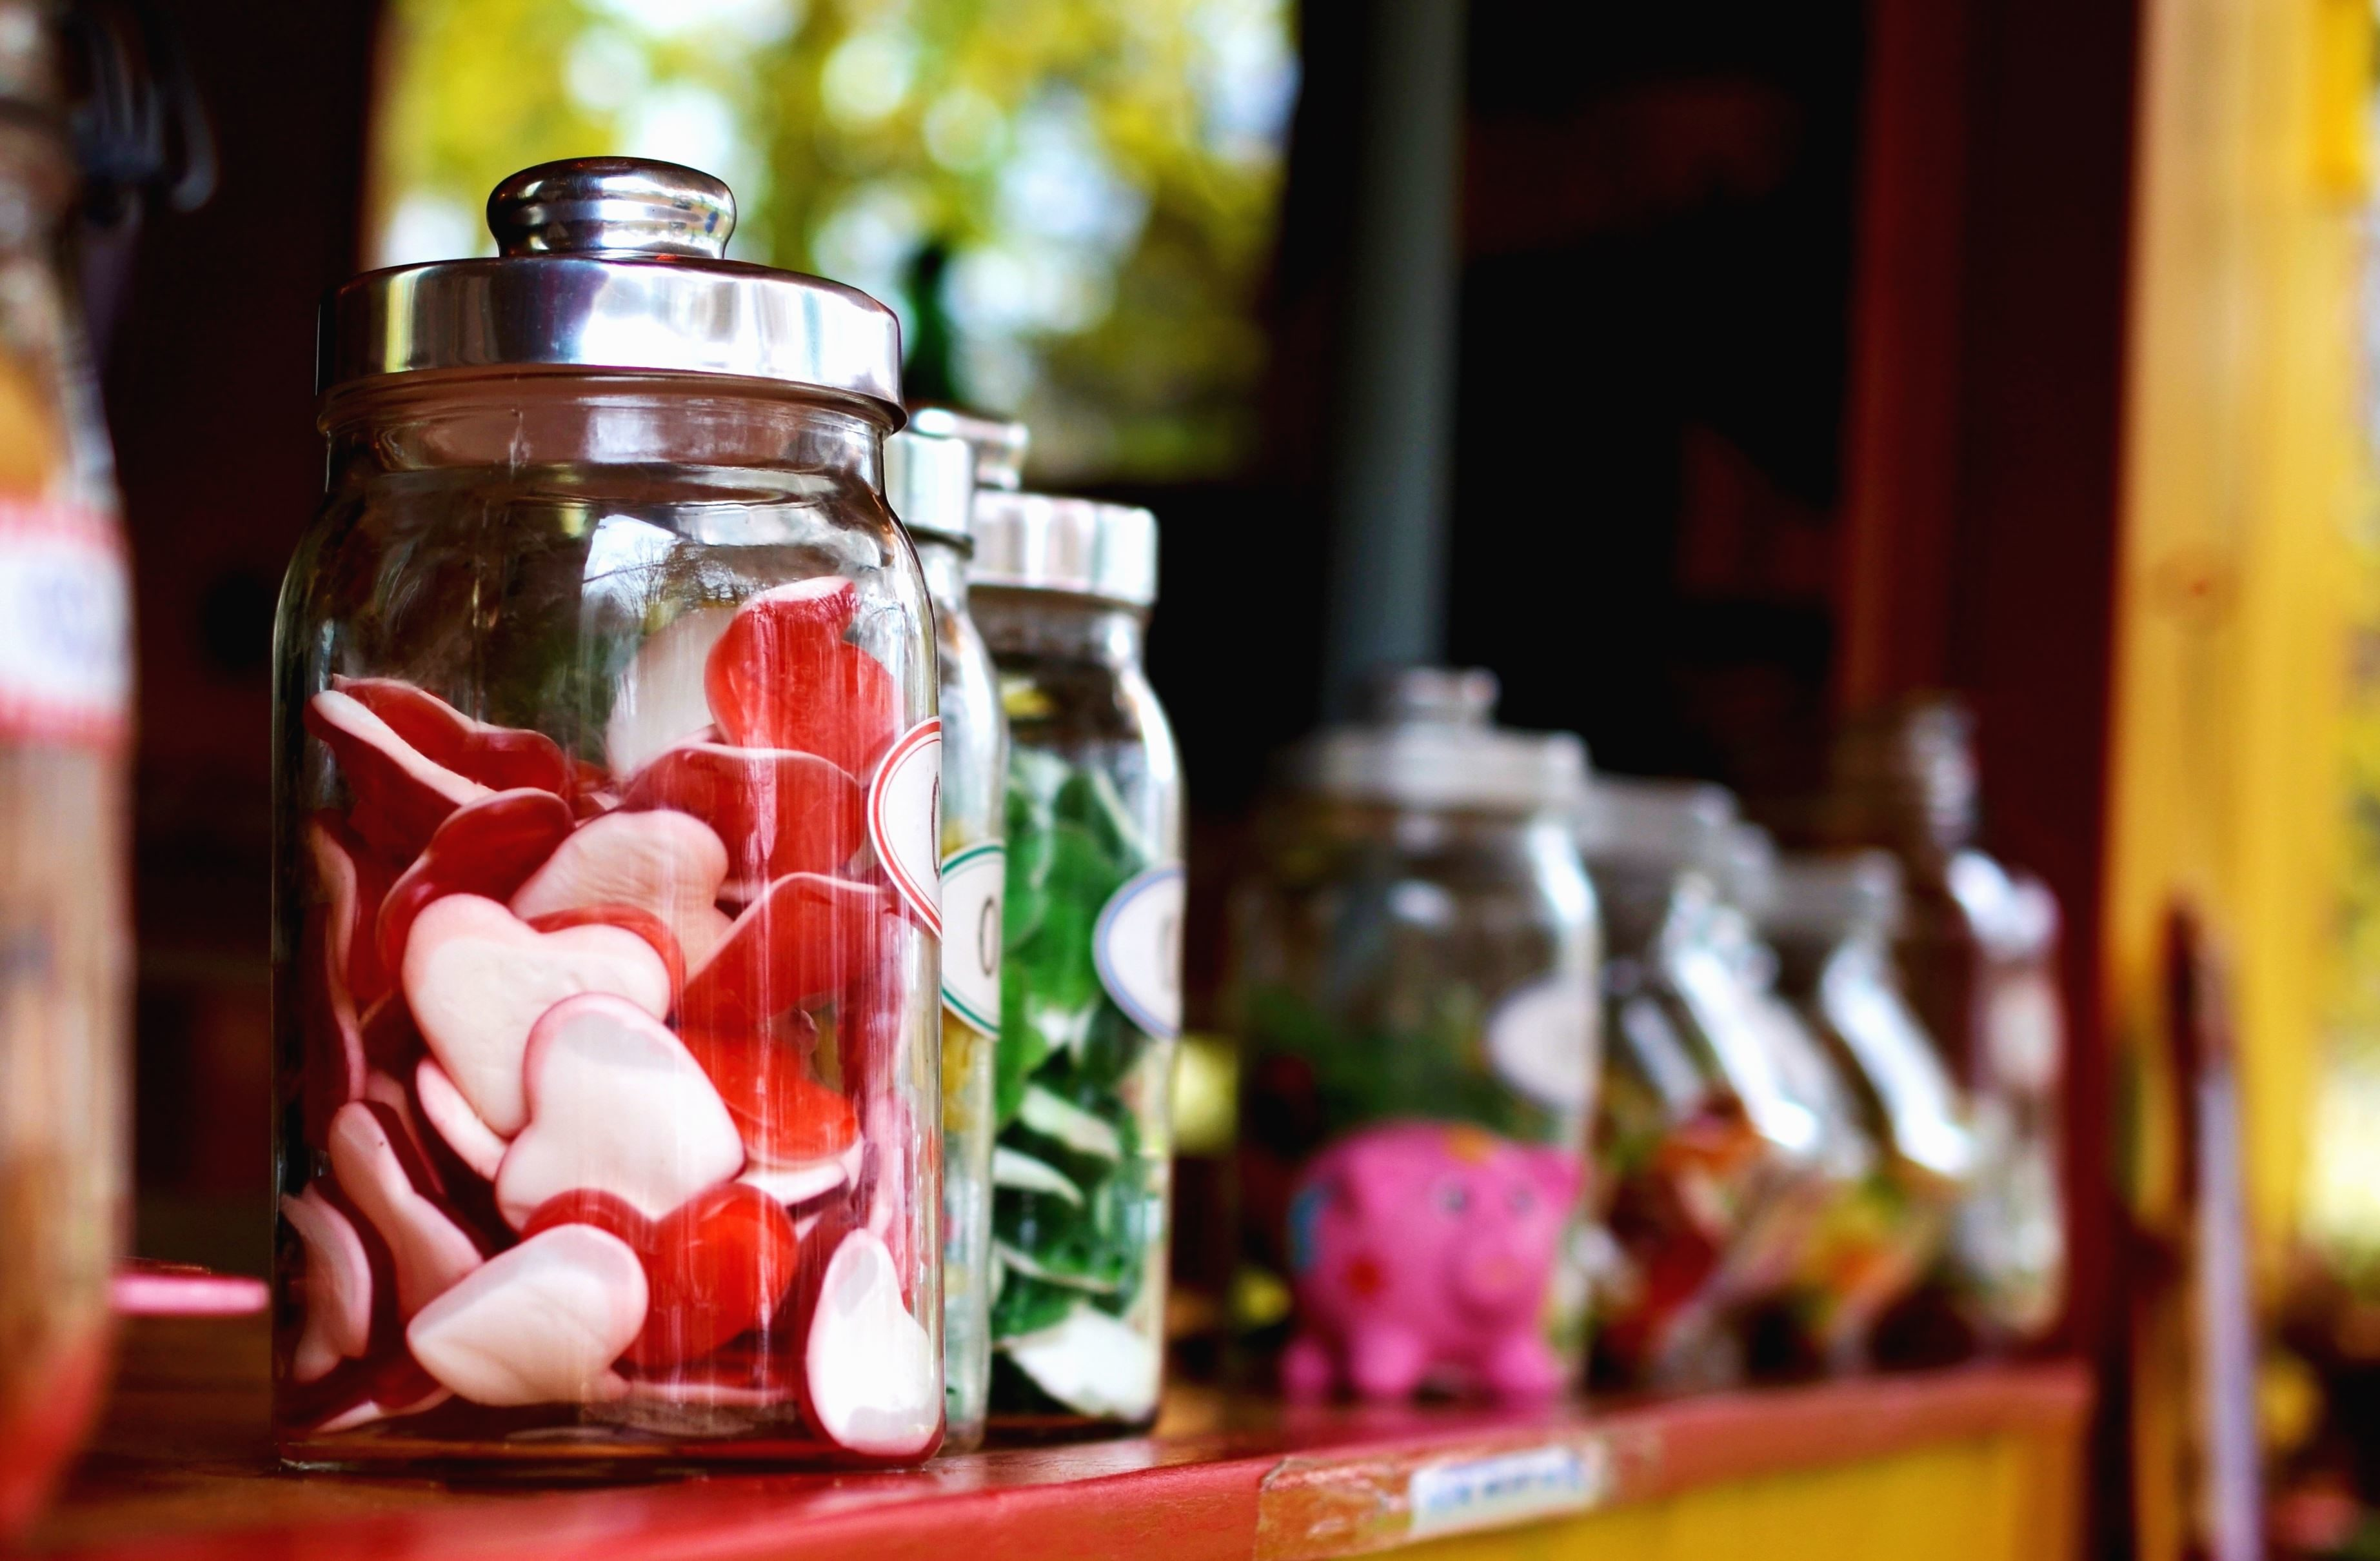 Free picture jar candy glass shelf heart